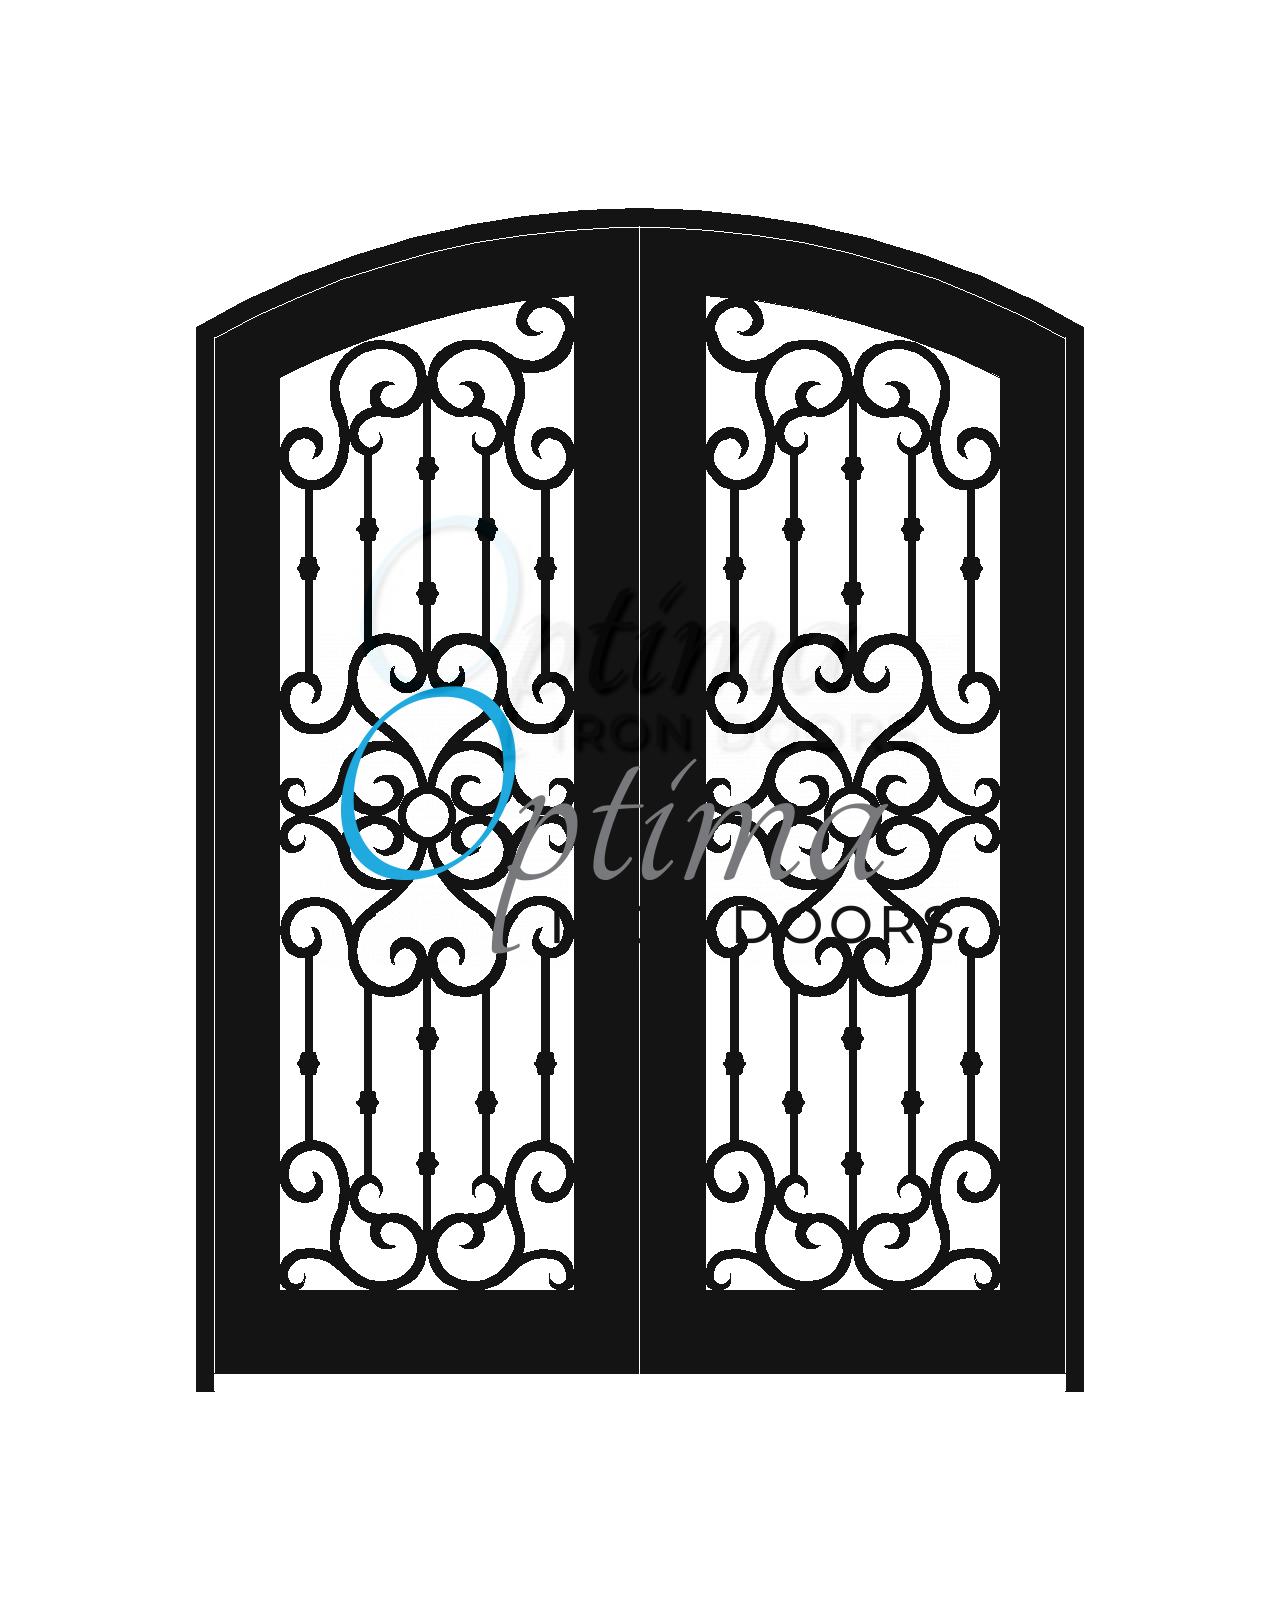 Standard Profile Arch Top Full Lite Decorative Glass Double Iron Door - MADRID OID-6080-MADAT